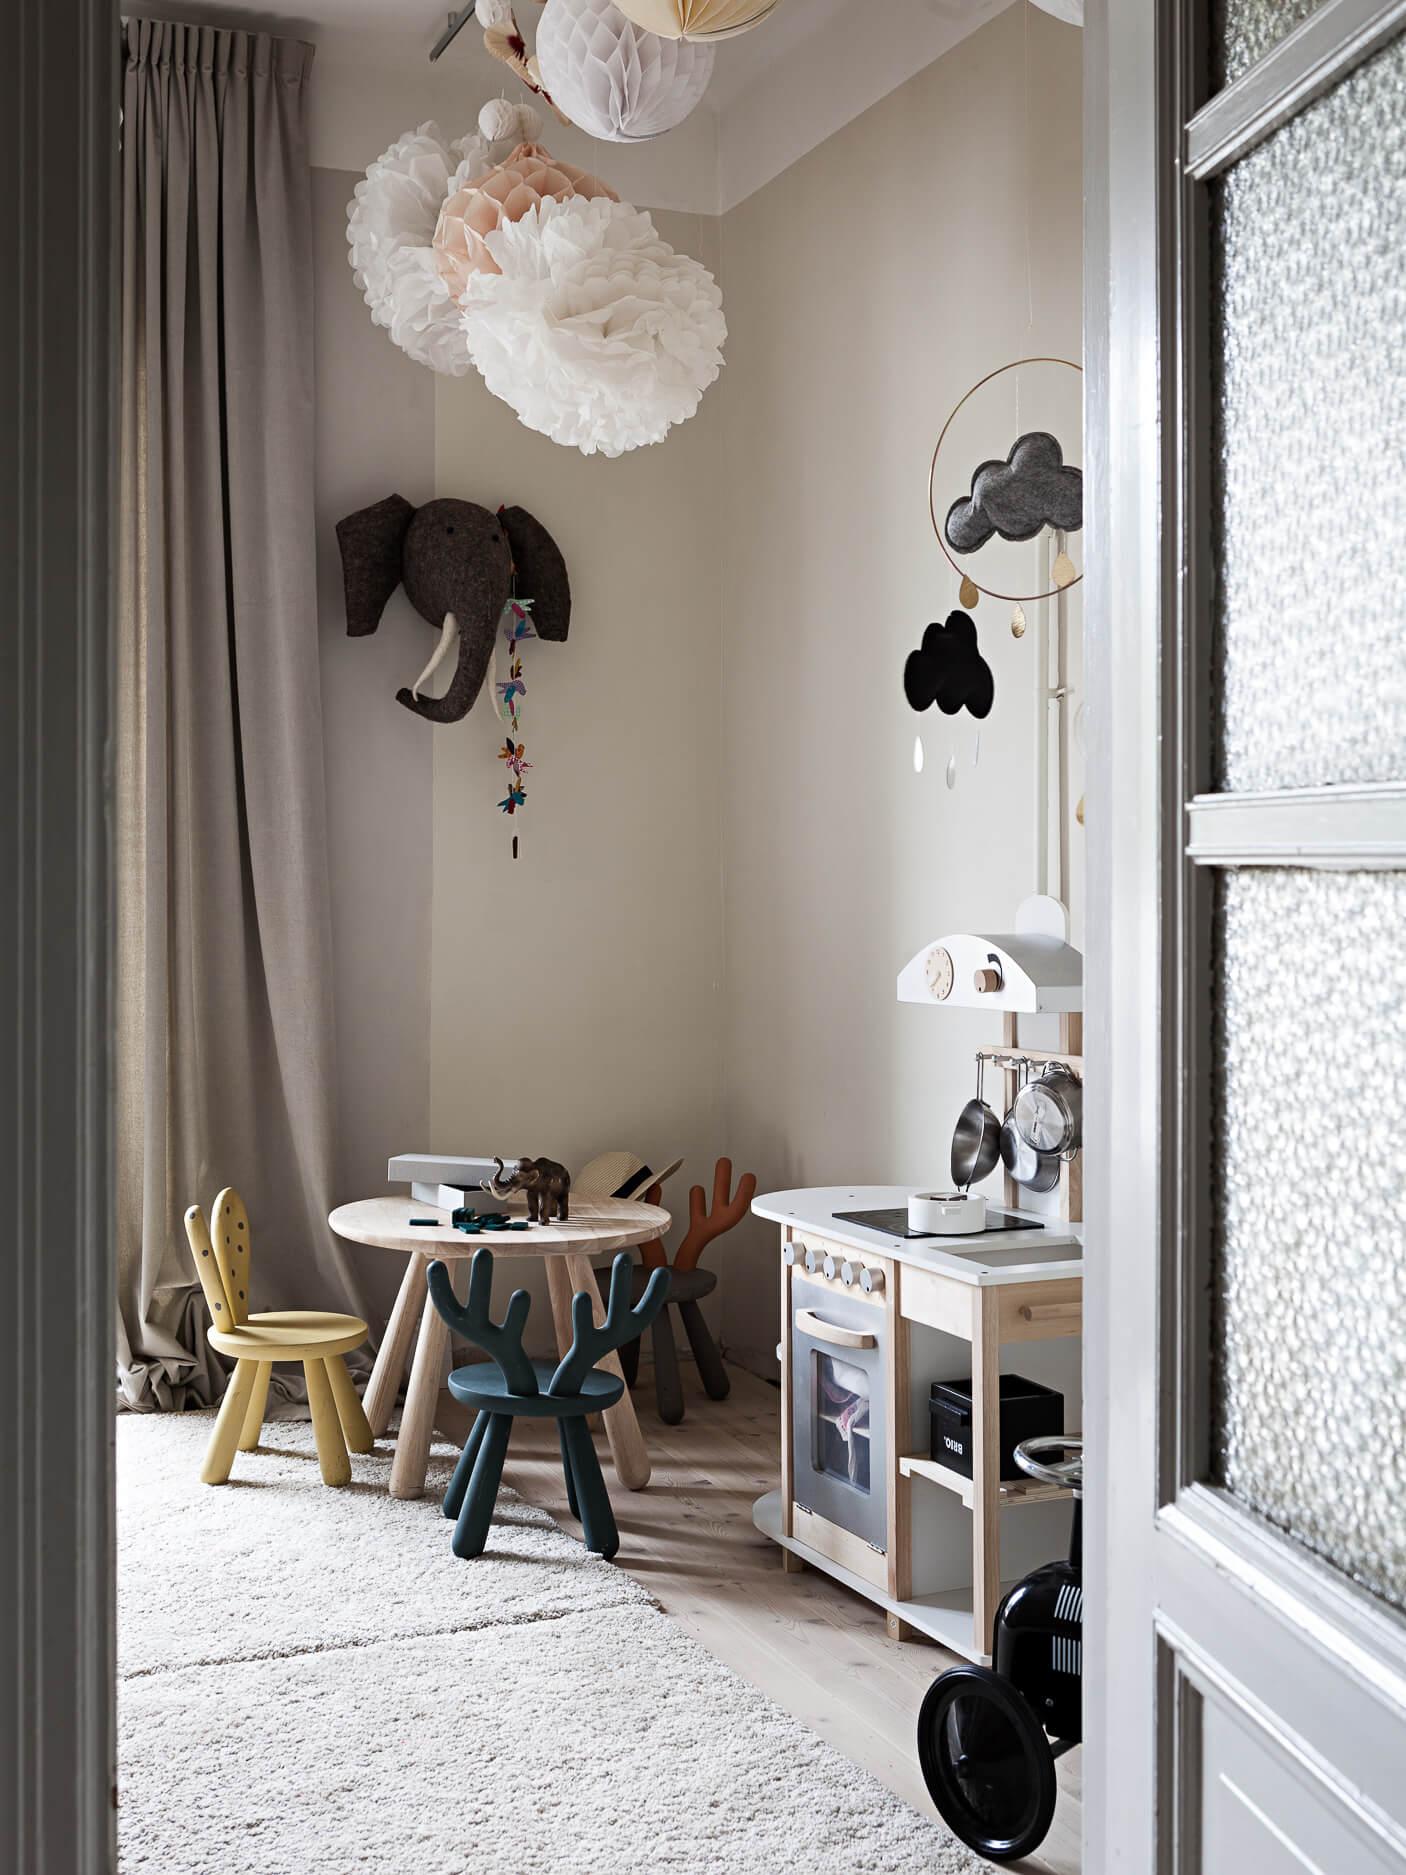 PAUL & PAULA: a delightful family home in Sweden